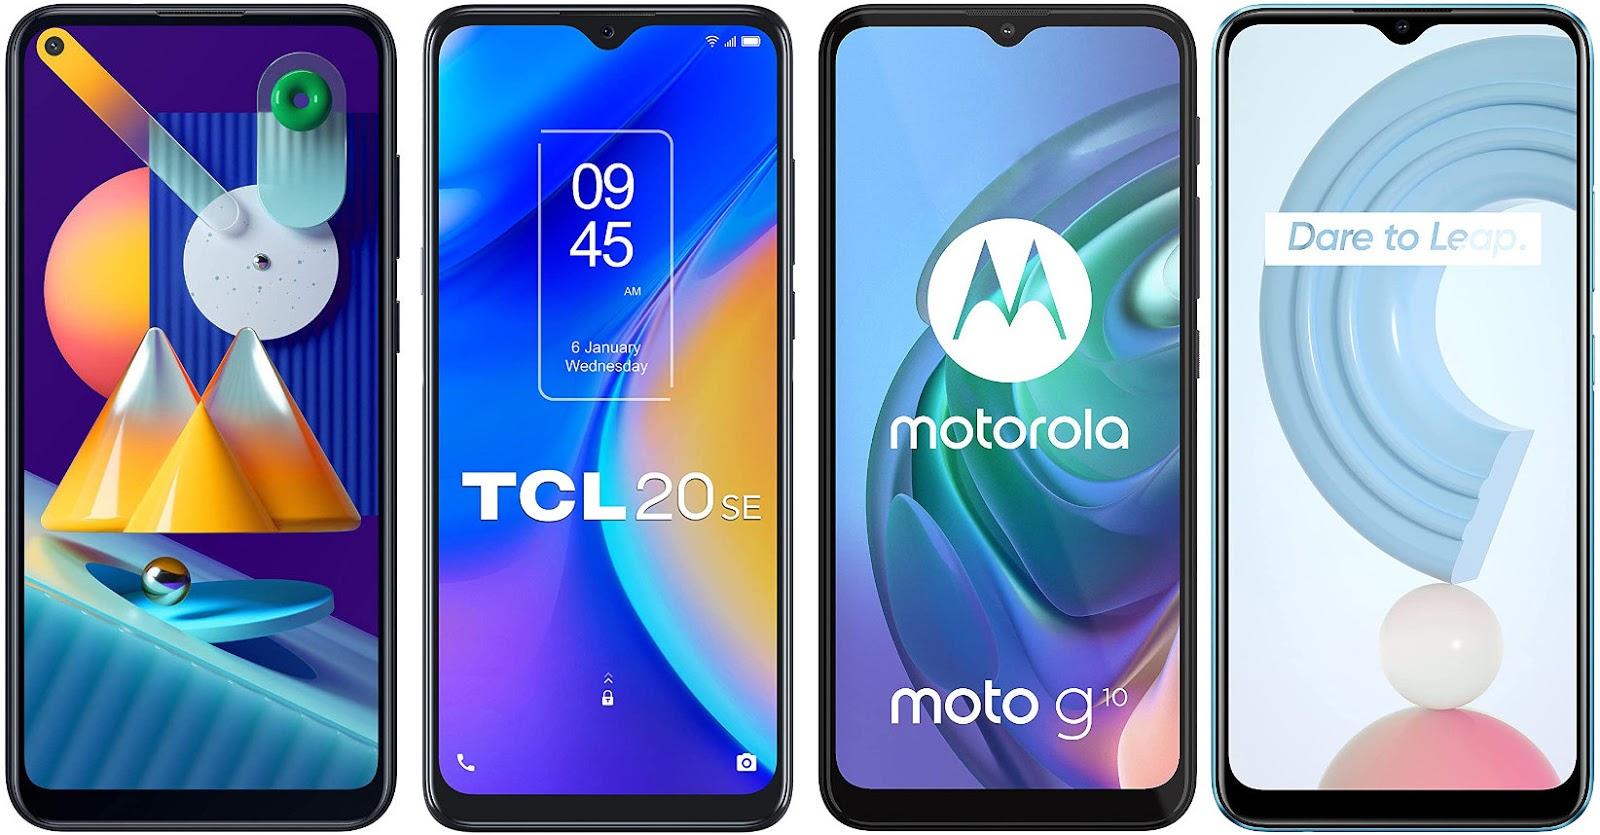 Samsung Galaxy M11 vs TCL 20 SE vs Motorola Moto G10 vs Realme C21